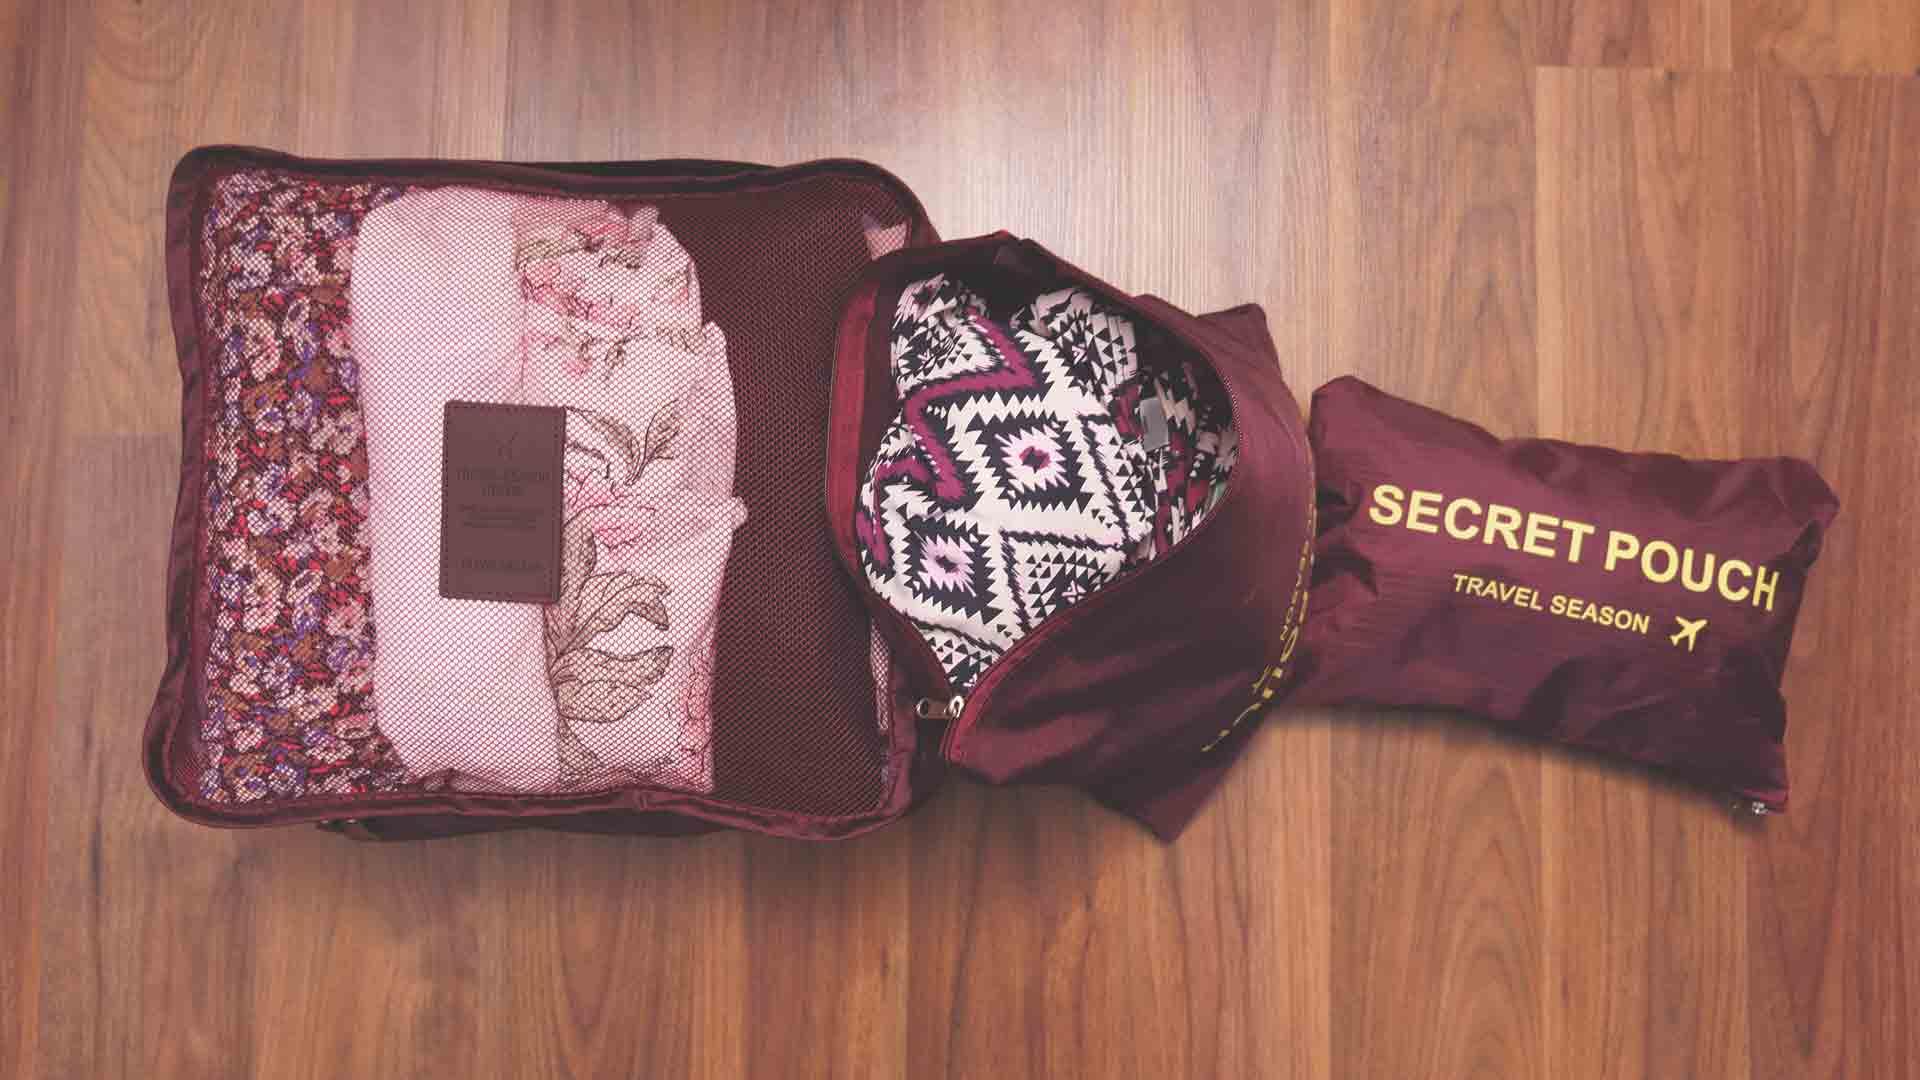 Backpacking Packliste Südostasien - Fertig gepackte Packtaschen, Packbeutel